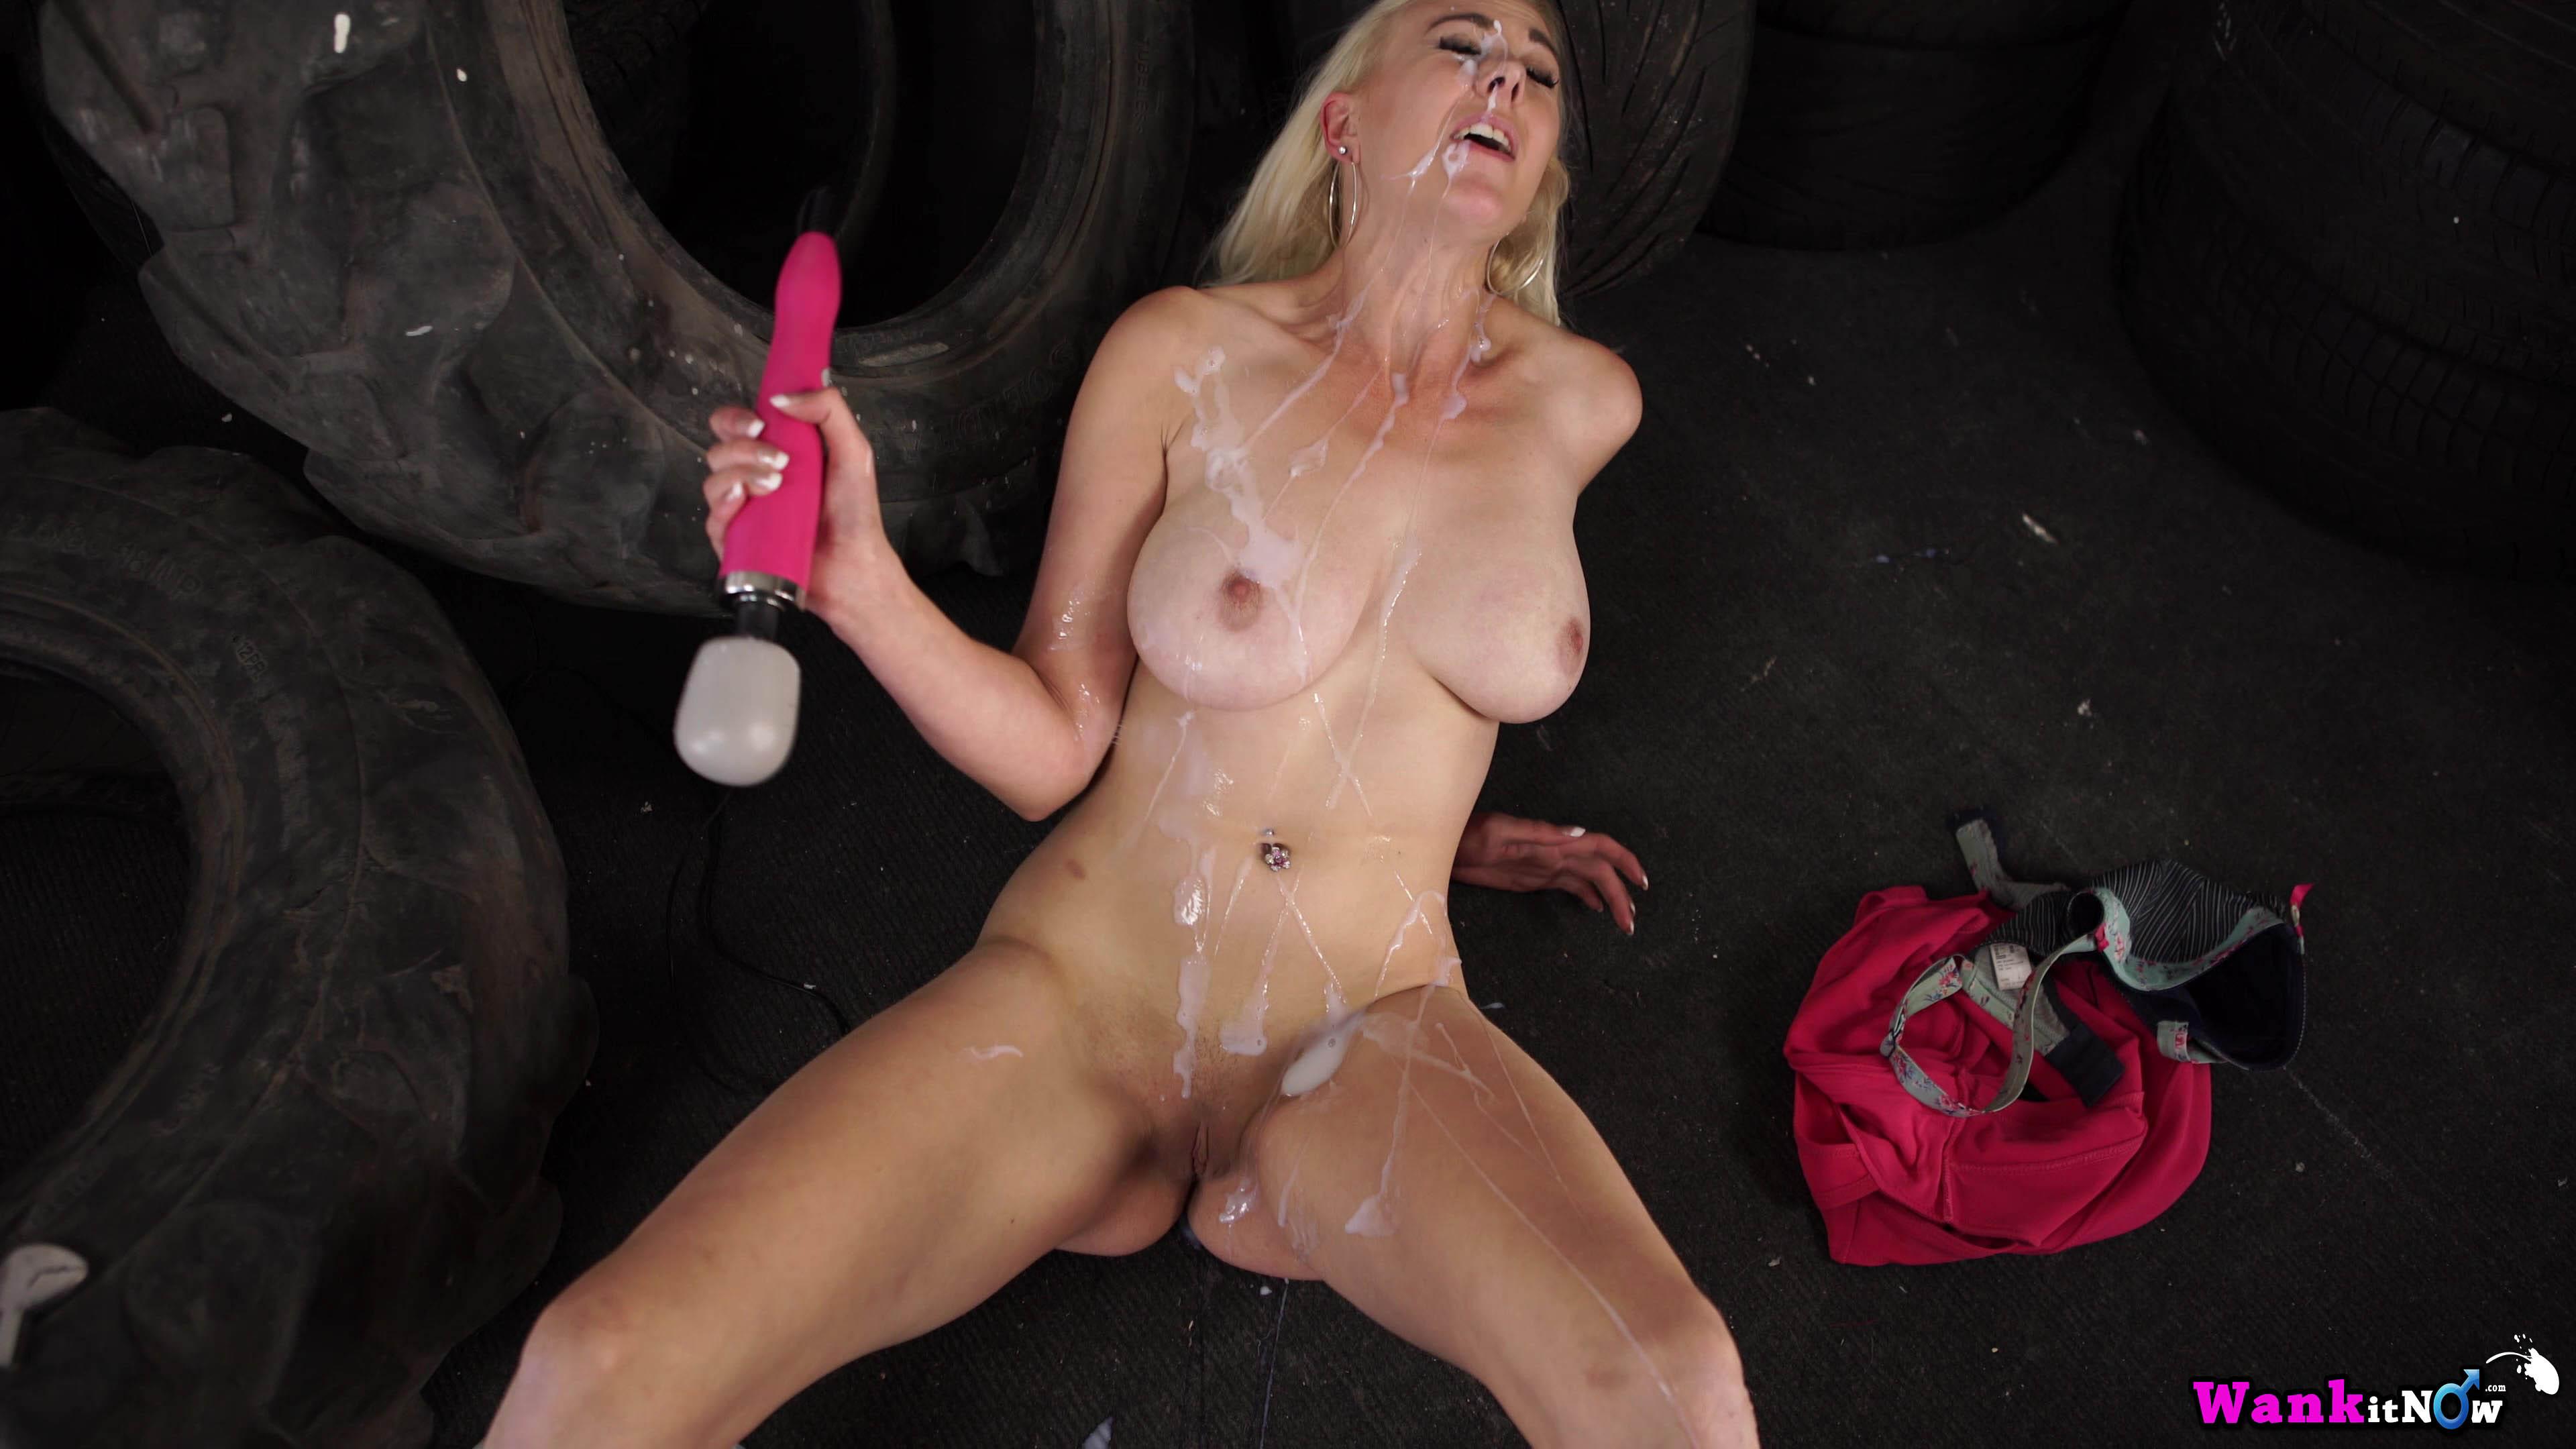 Sapphire Blue - Garage Blowbang Pt2 - Free photos of naked ...